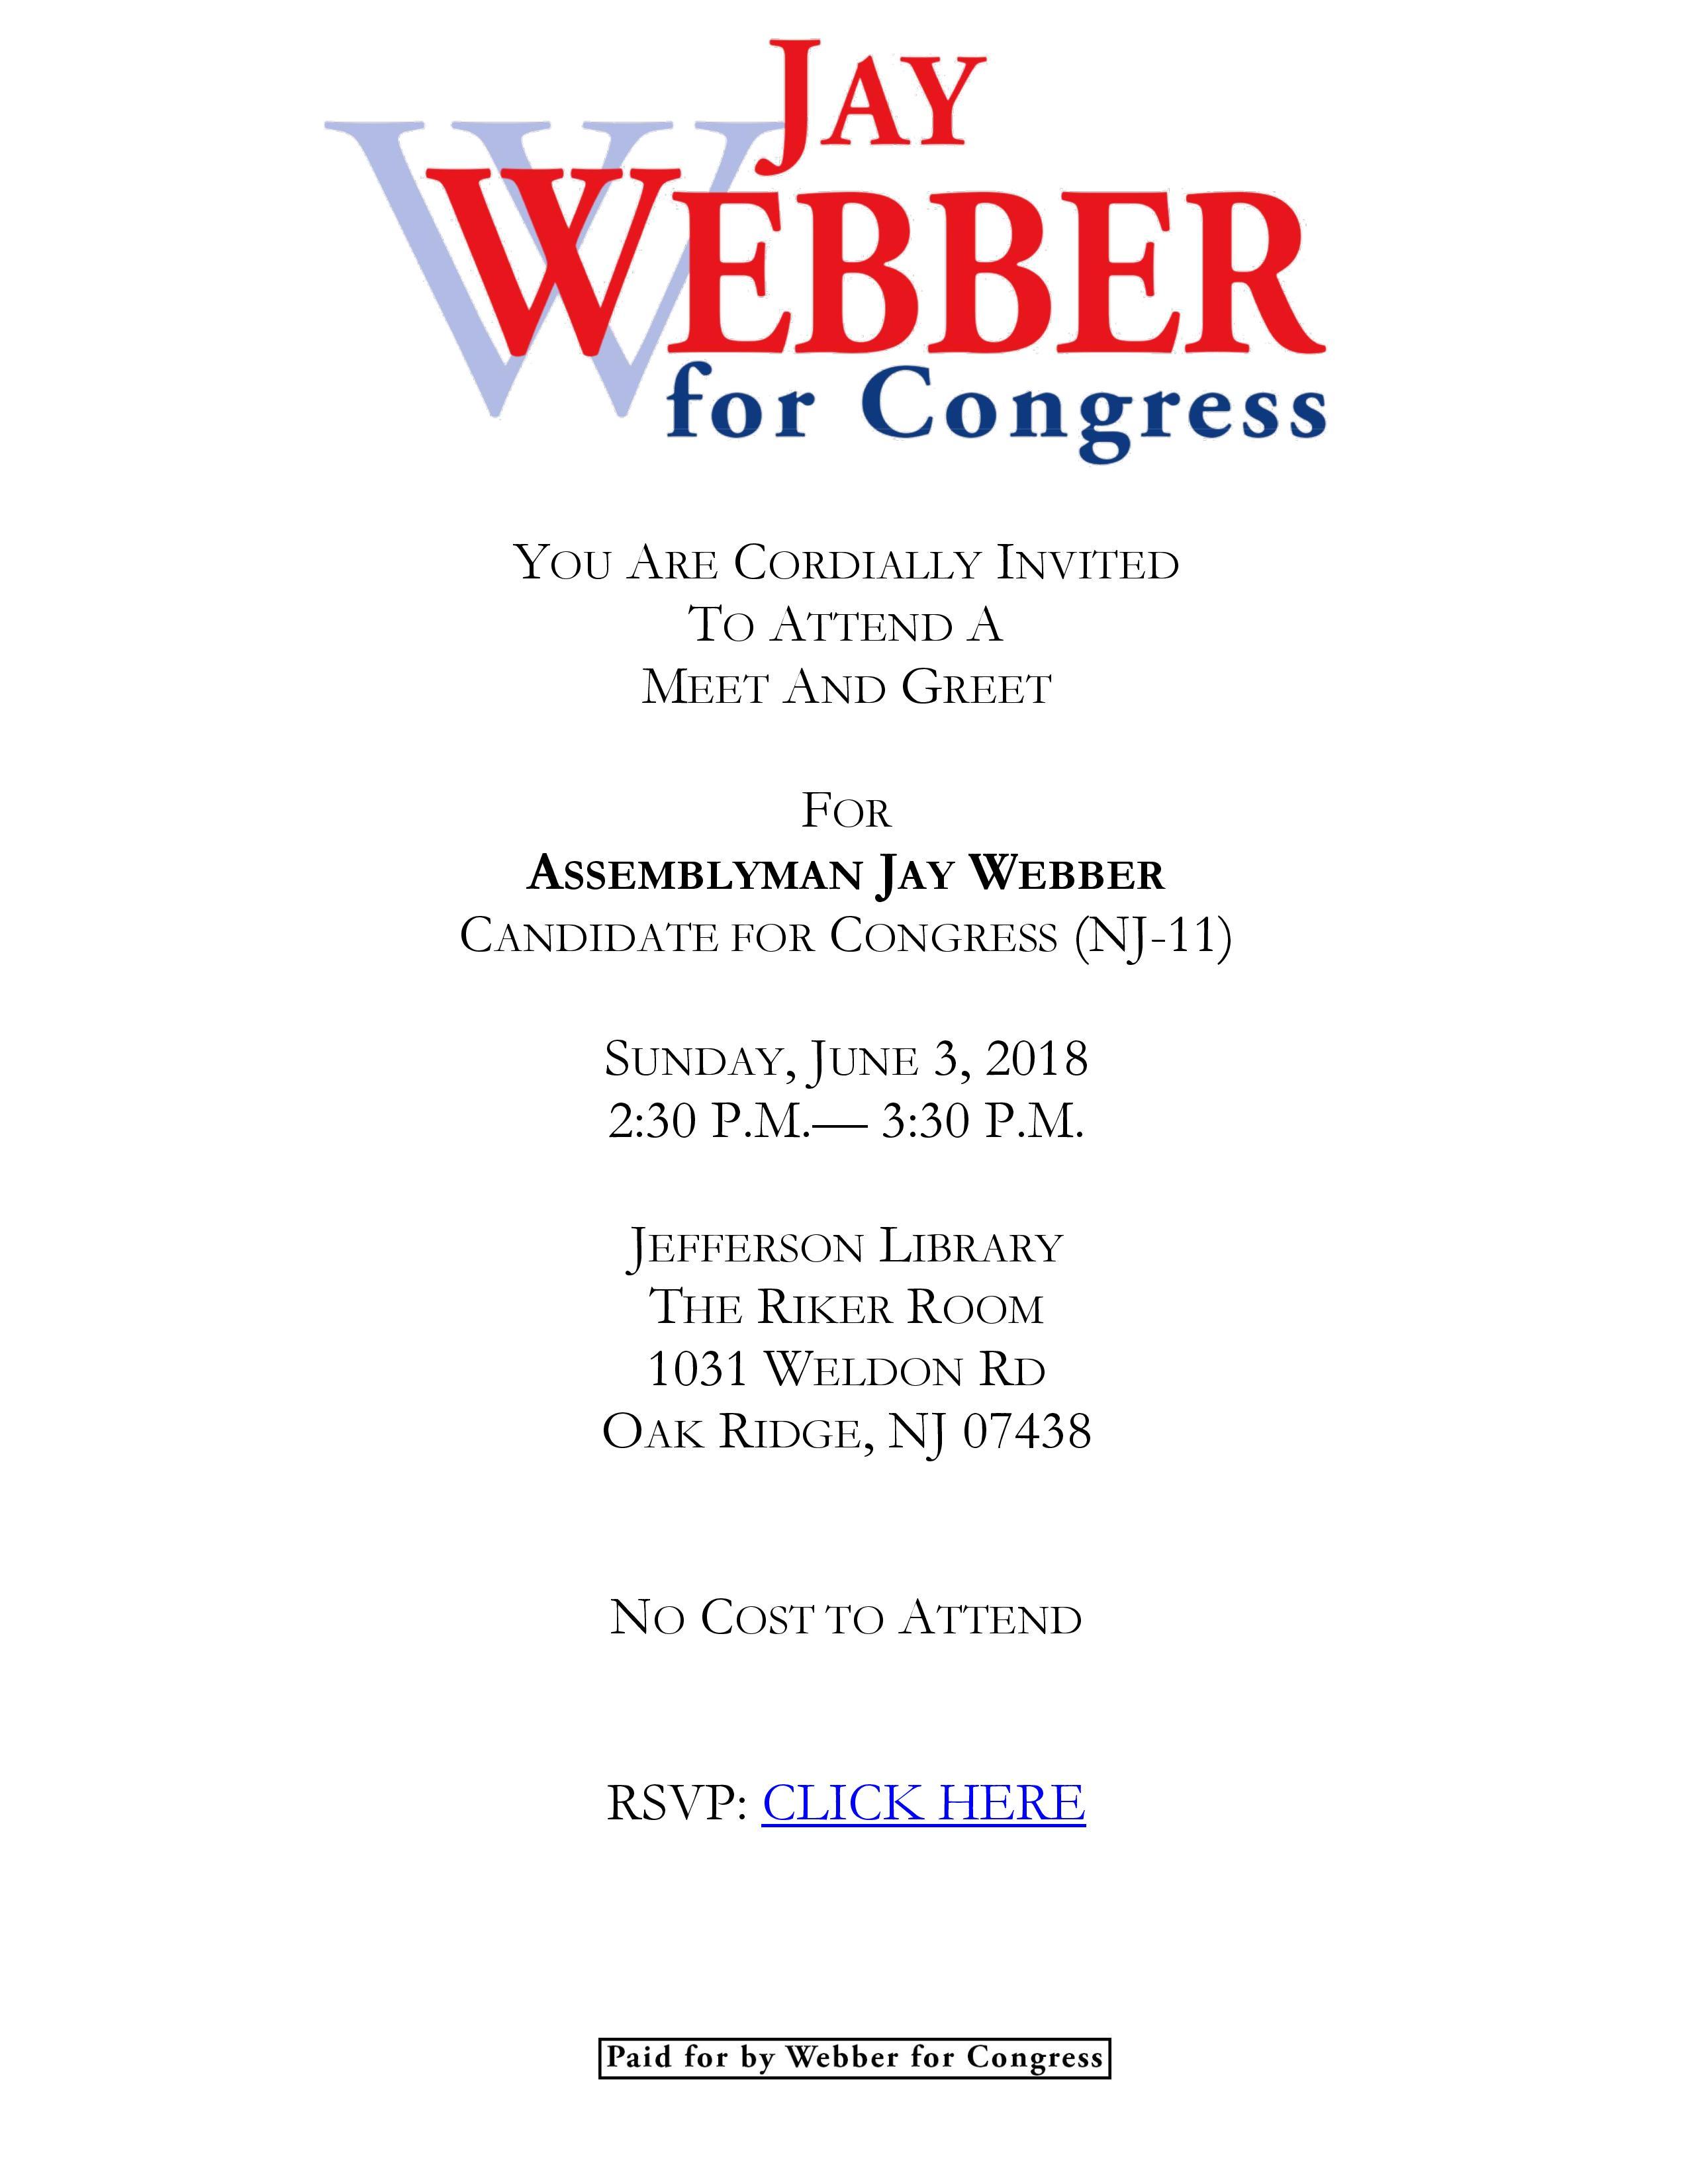 Webber_Jefferson_Meet_and_Greet_Flyer-page-001.jpg